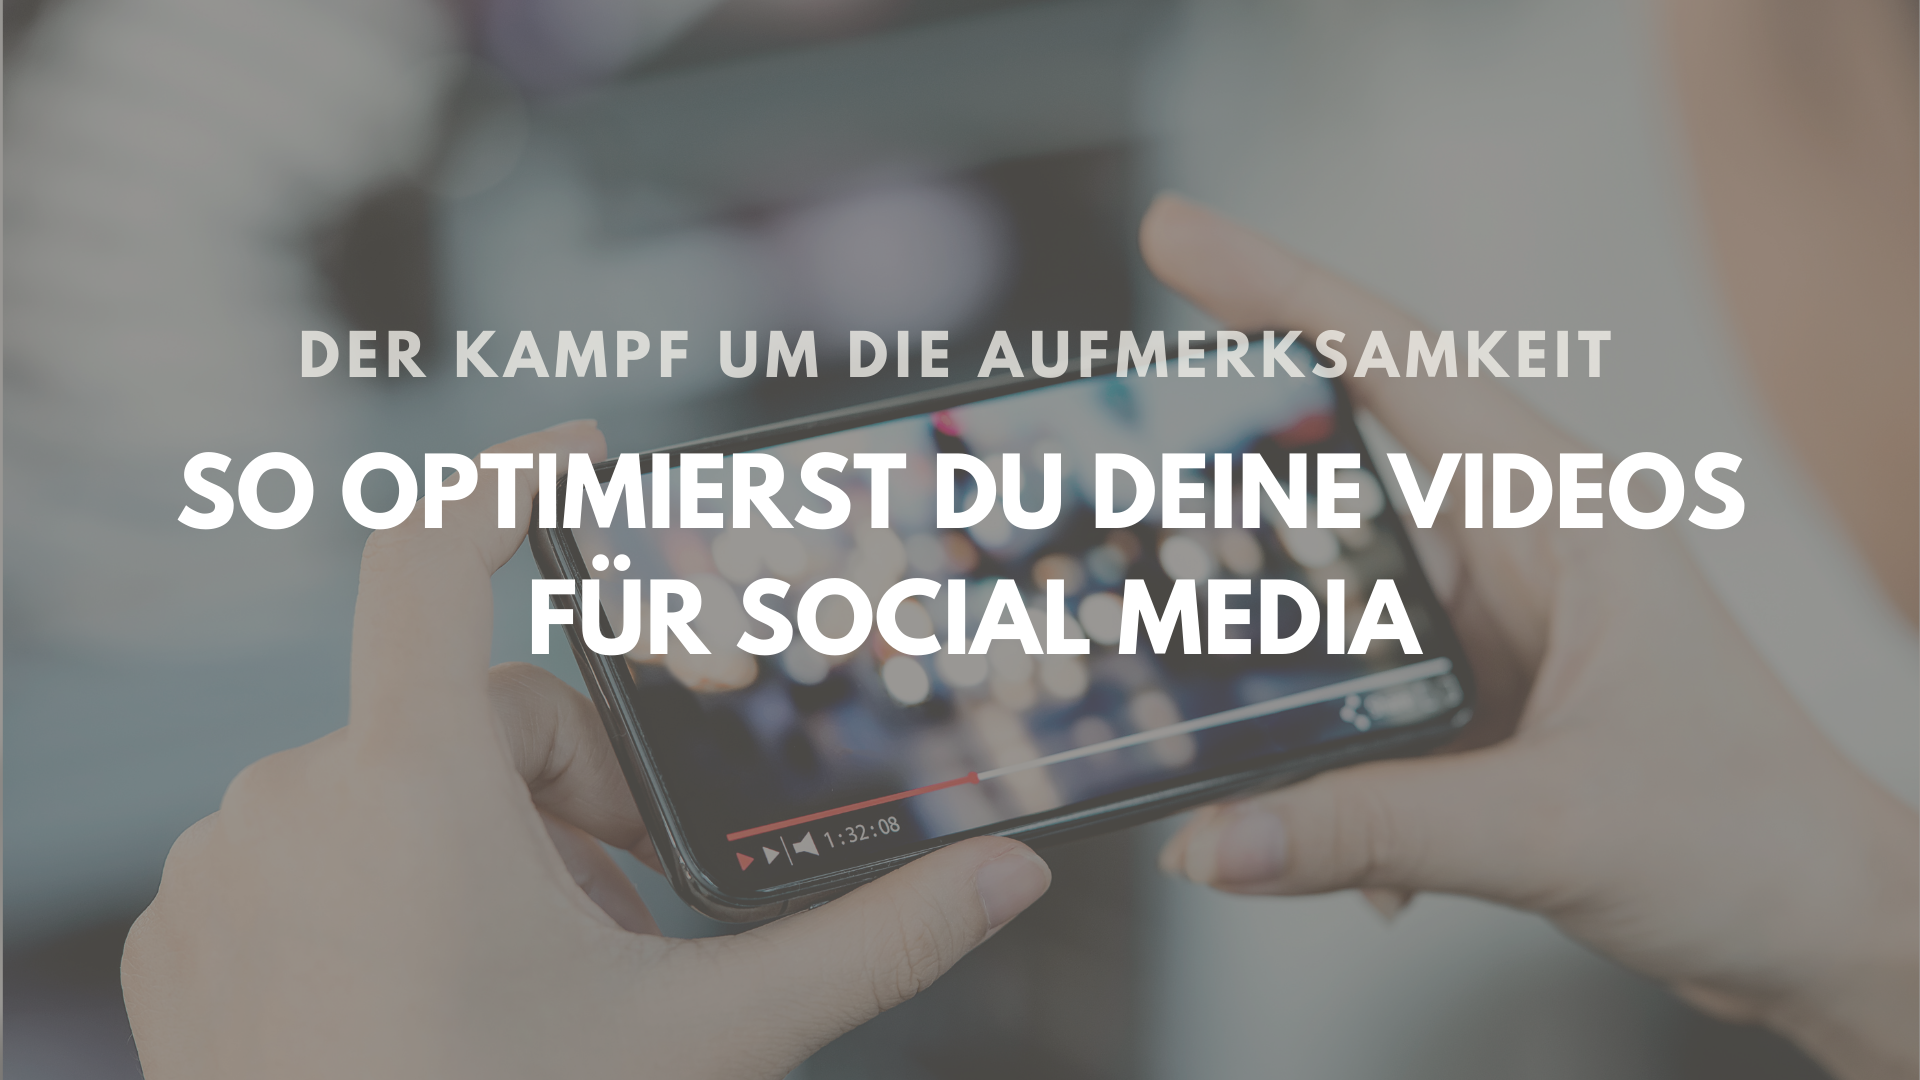 So optimierst du deine Videos für Social Media